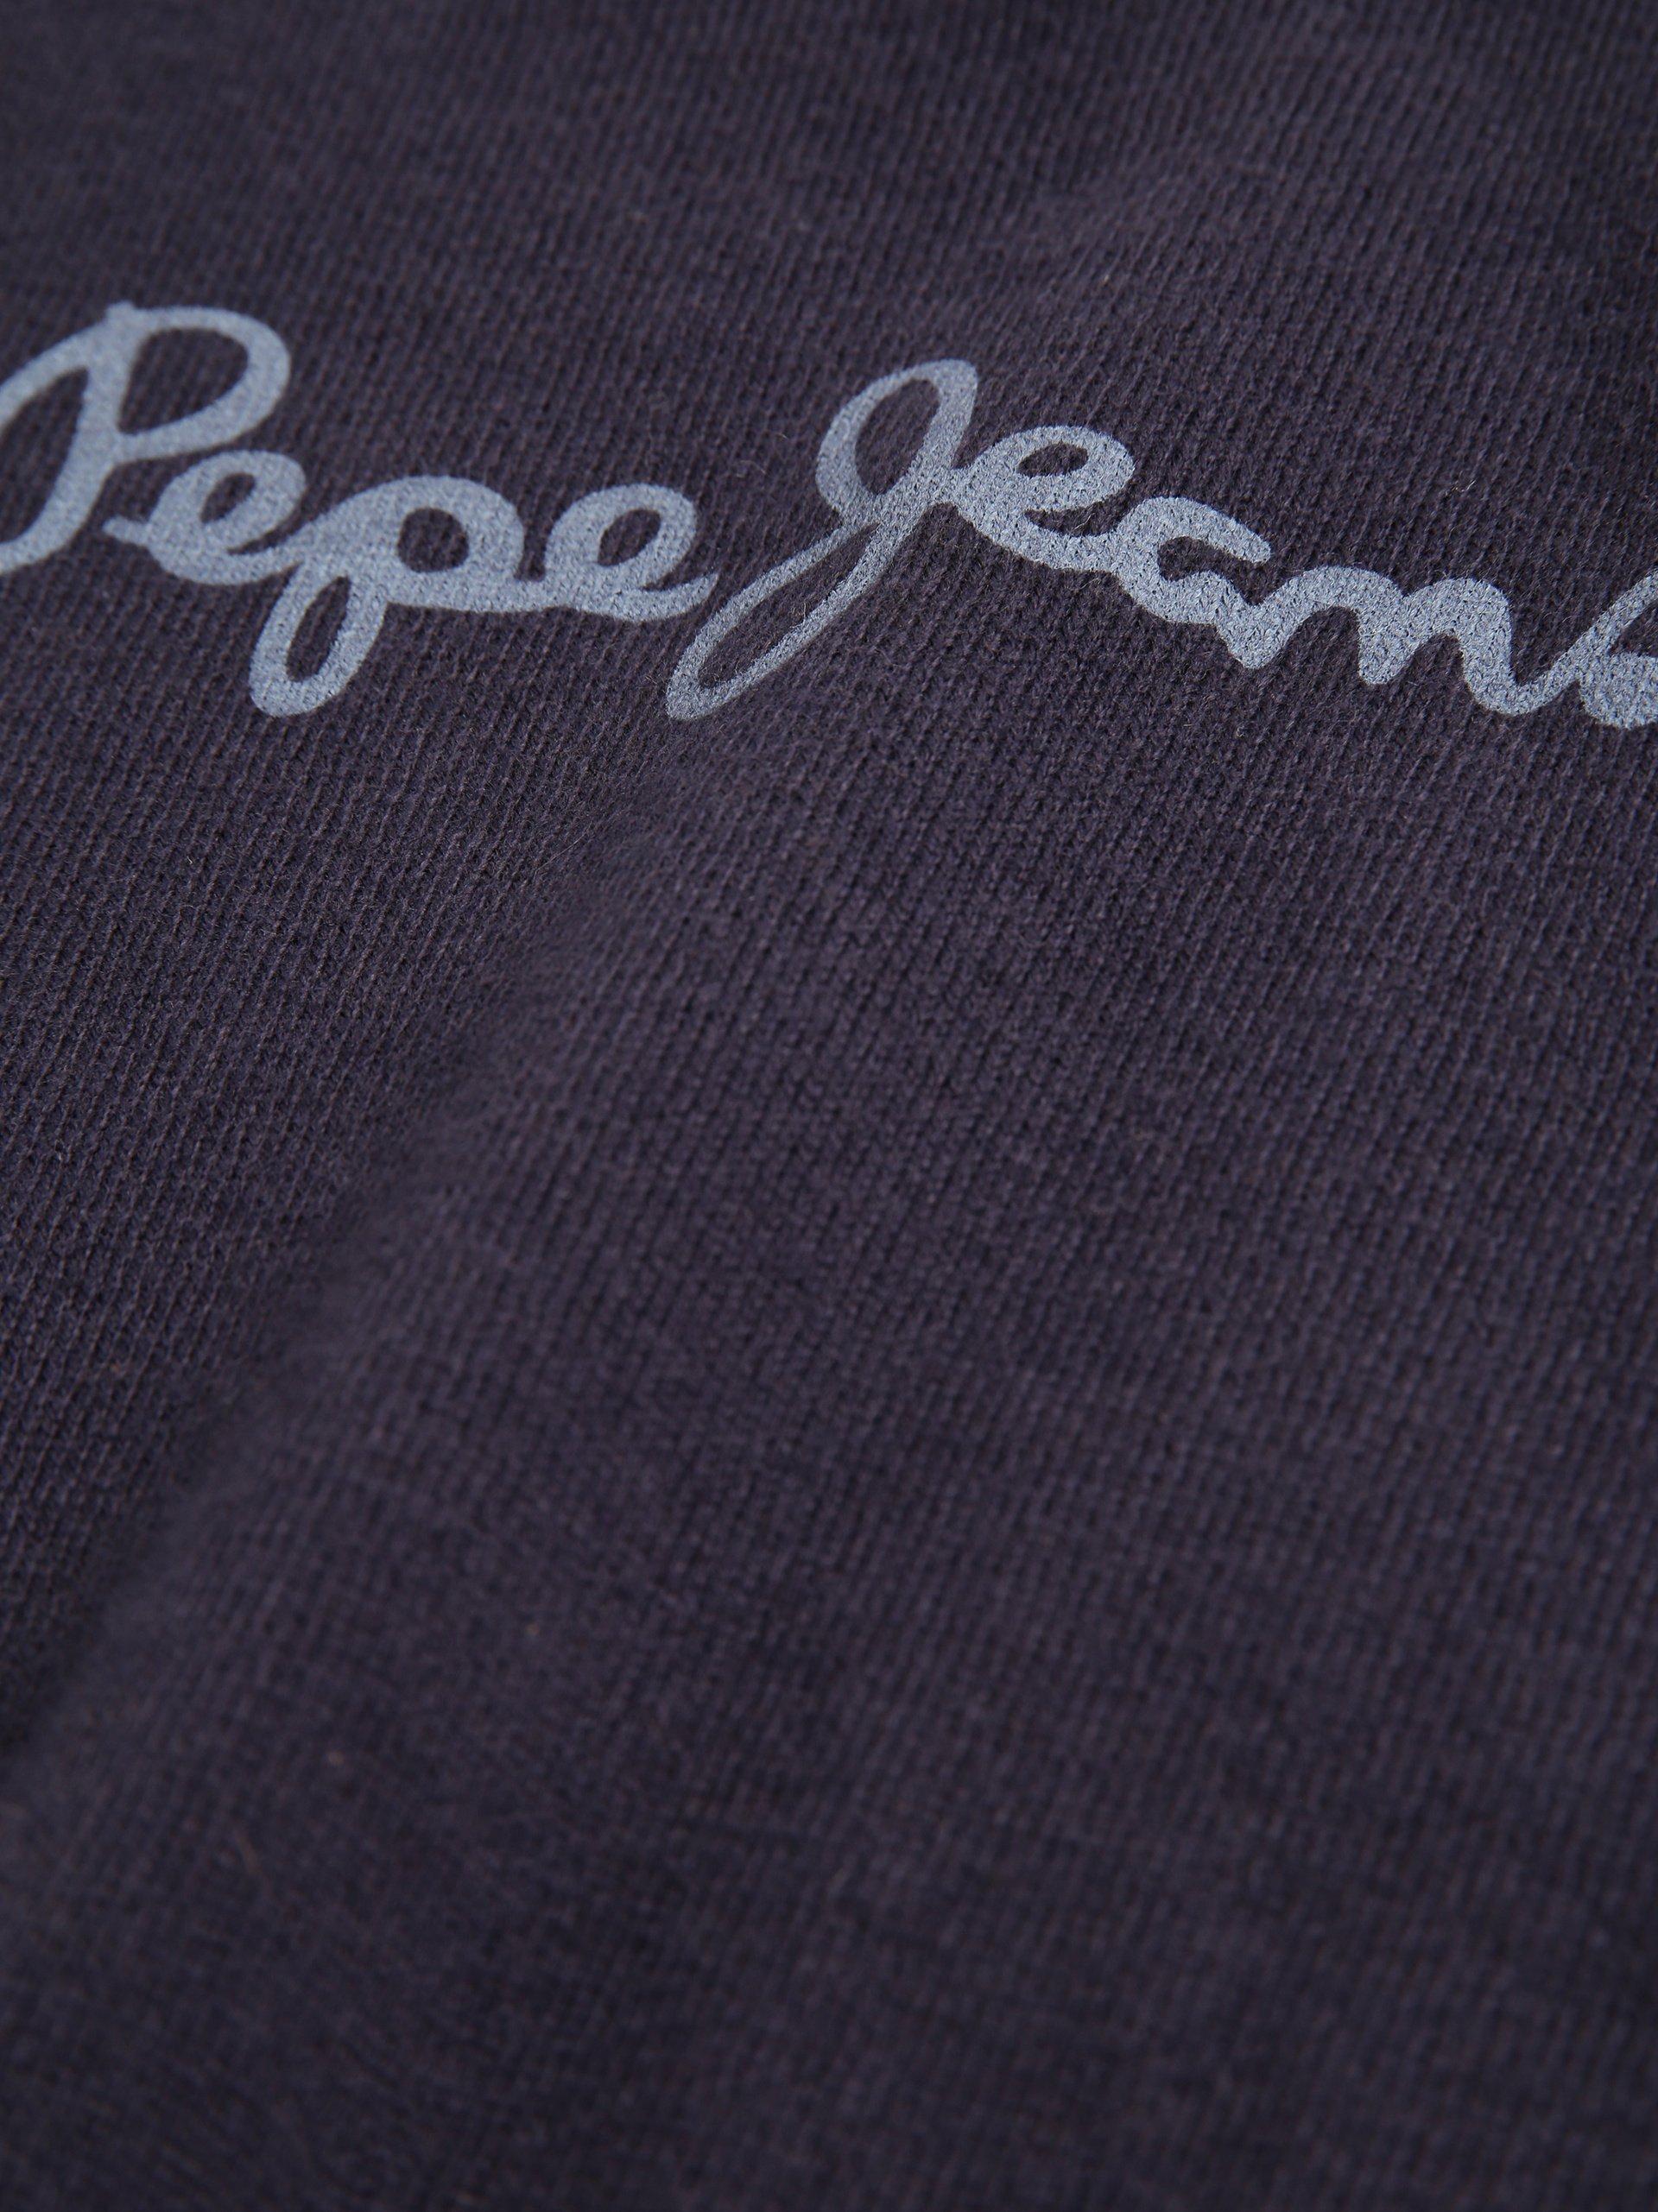 Pepe Jeans Jungen Pullover mit Cashmere-Anteil - Phil